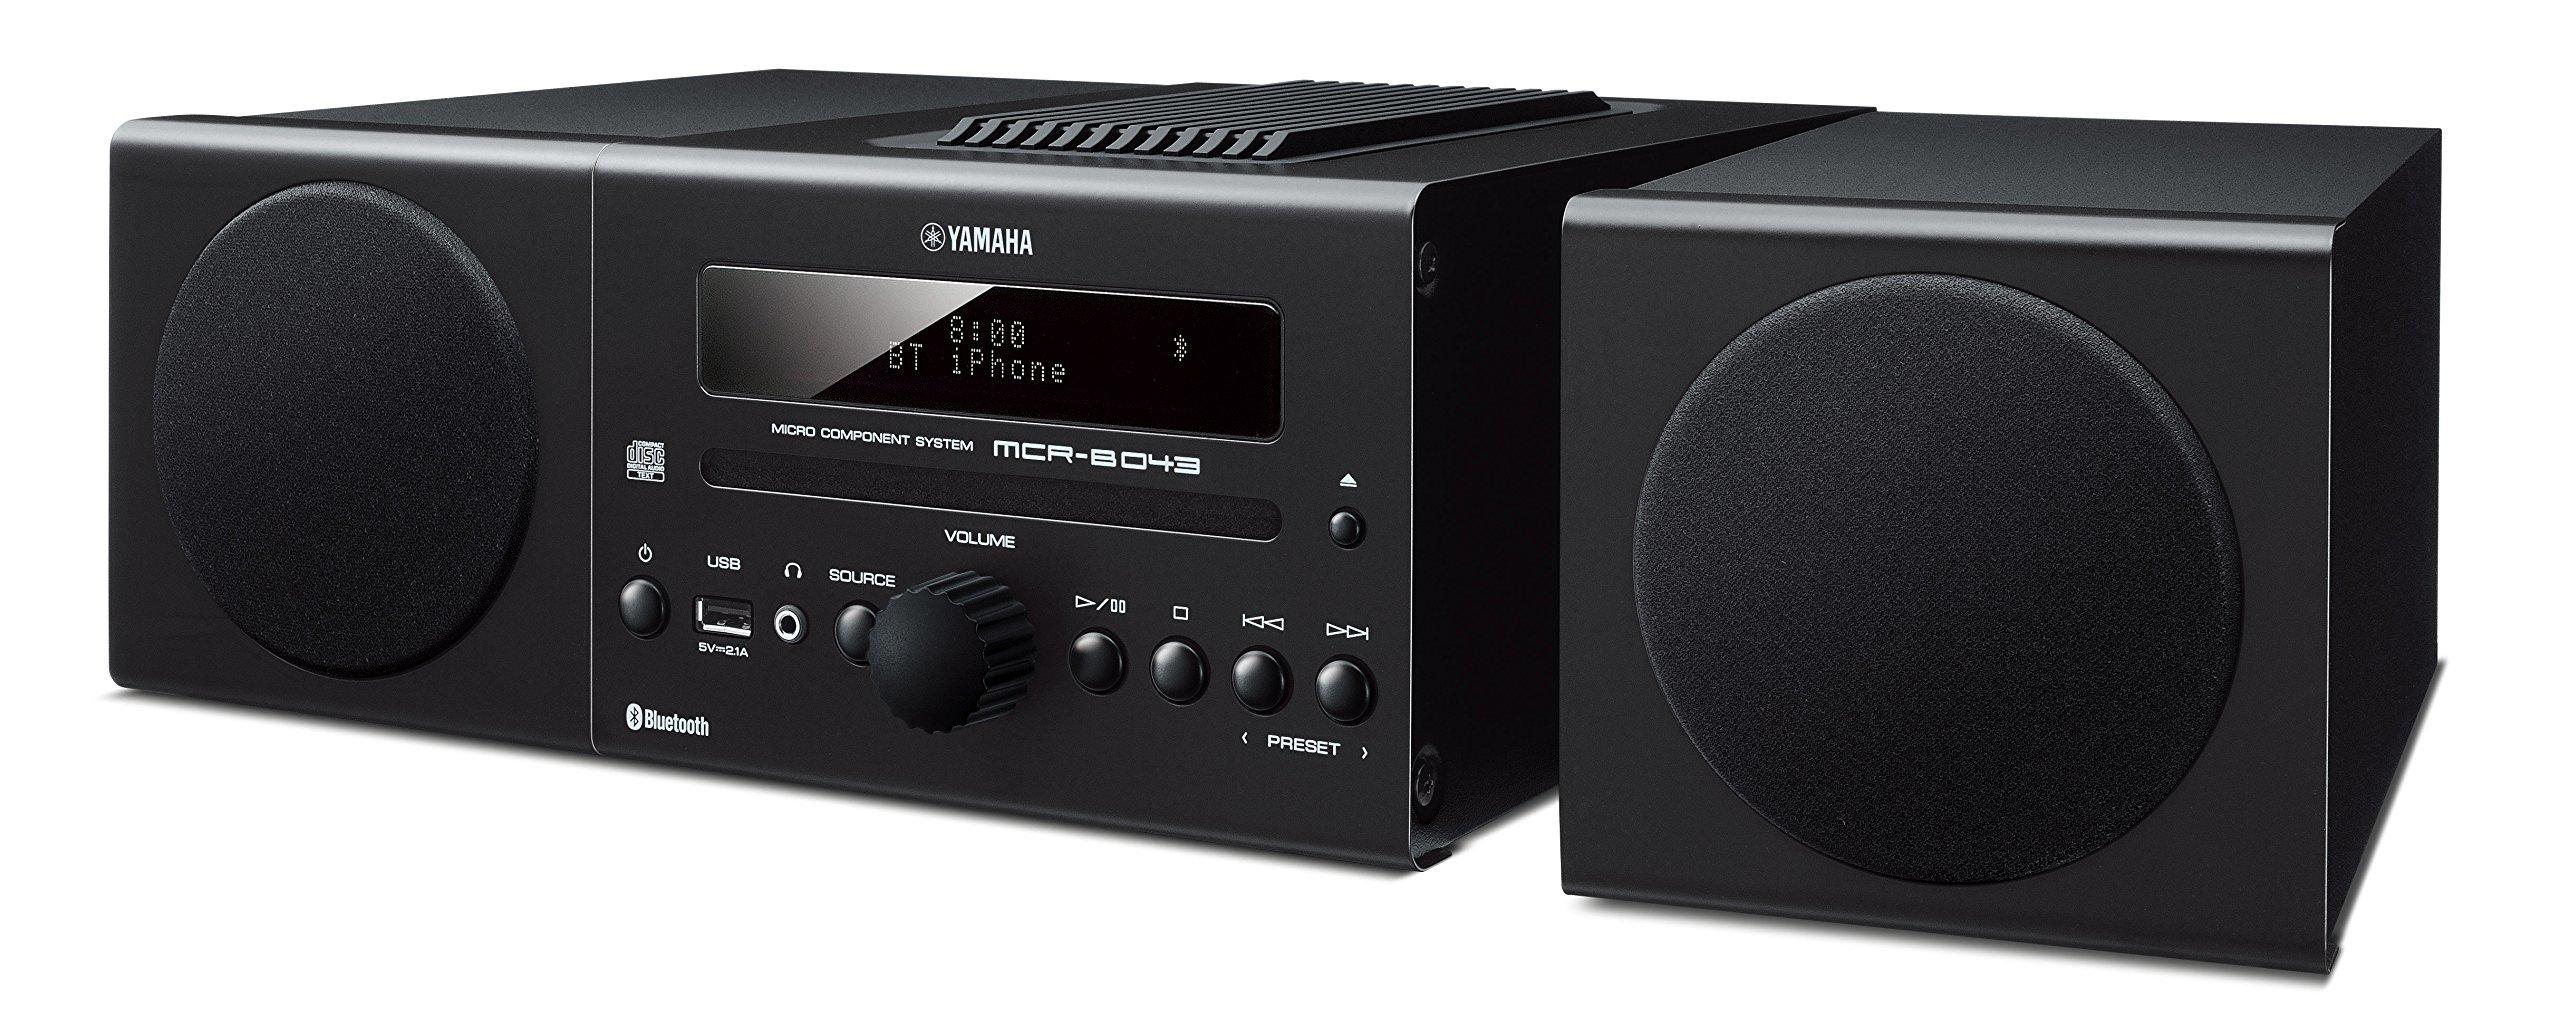 Yamaha MCR-B043BL Desktop Audio System, Black by Yamaha Audio